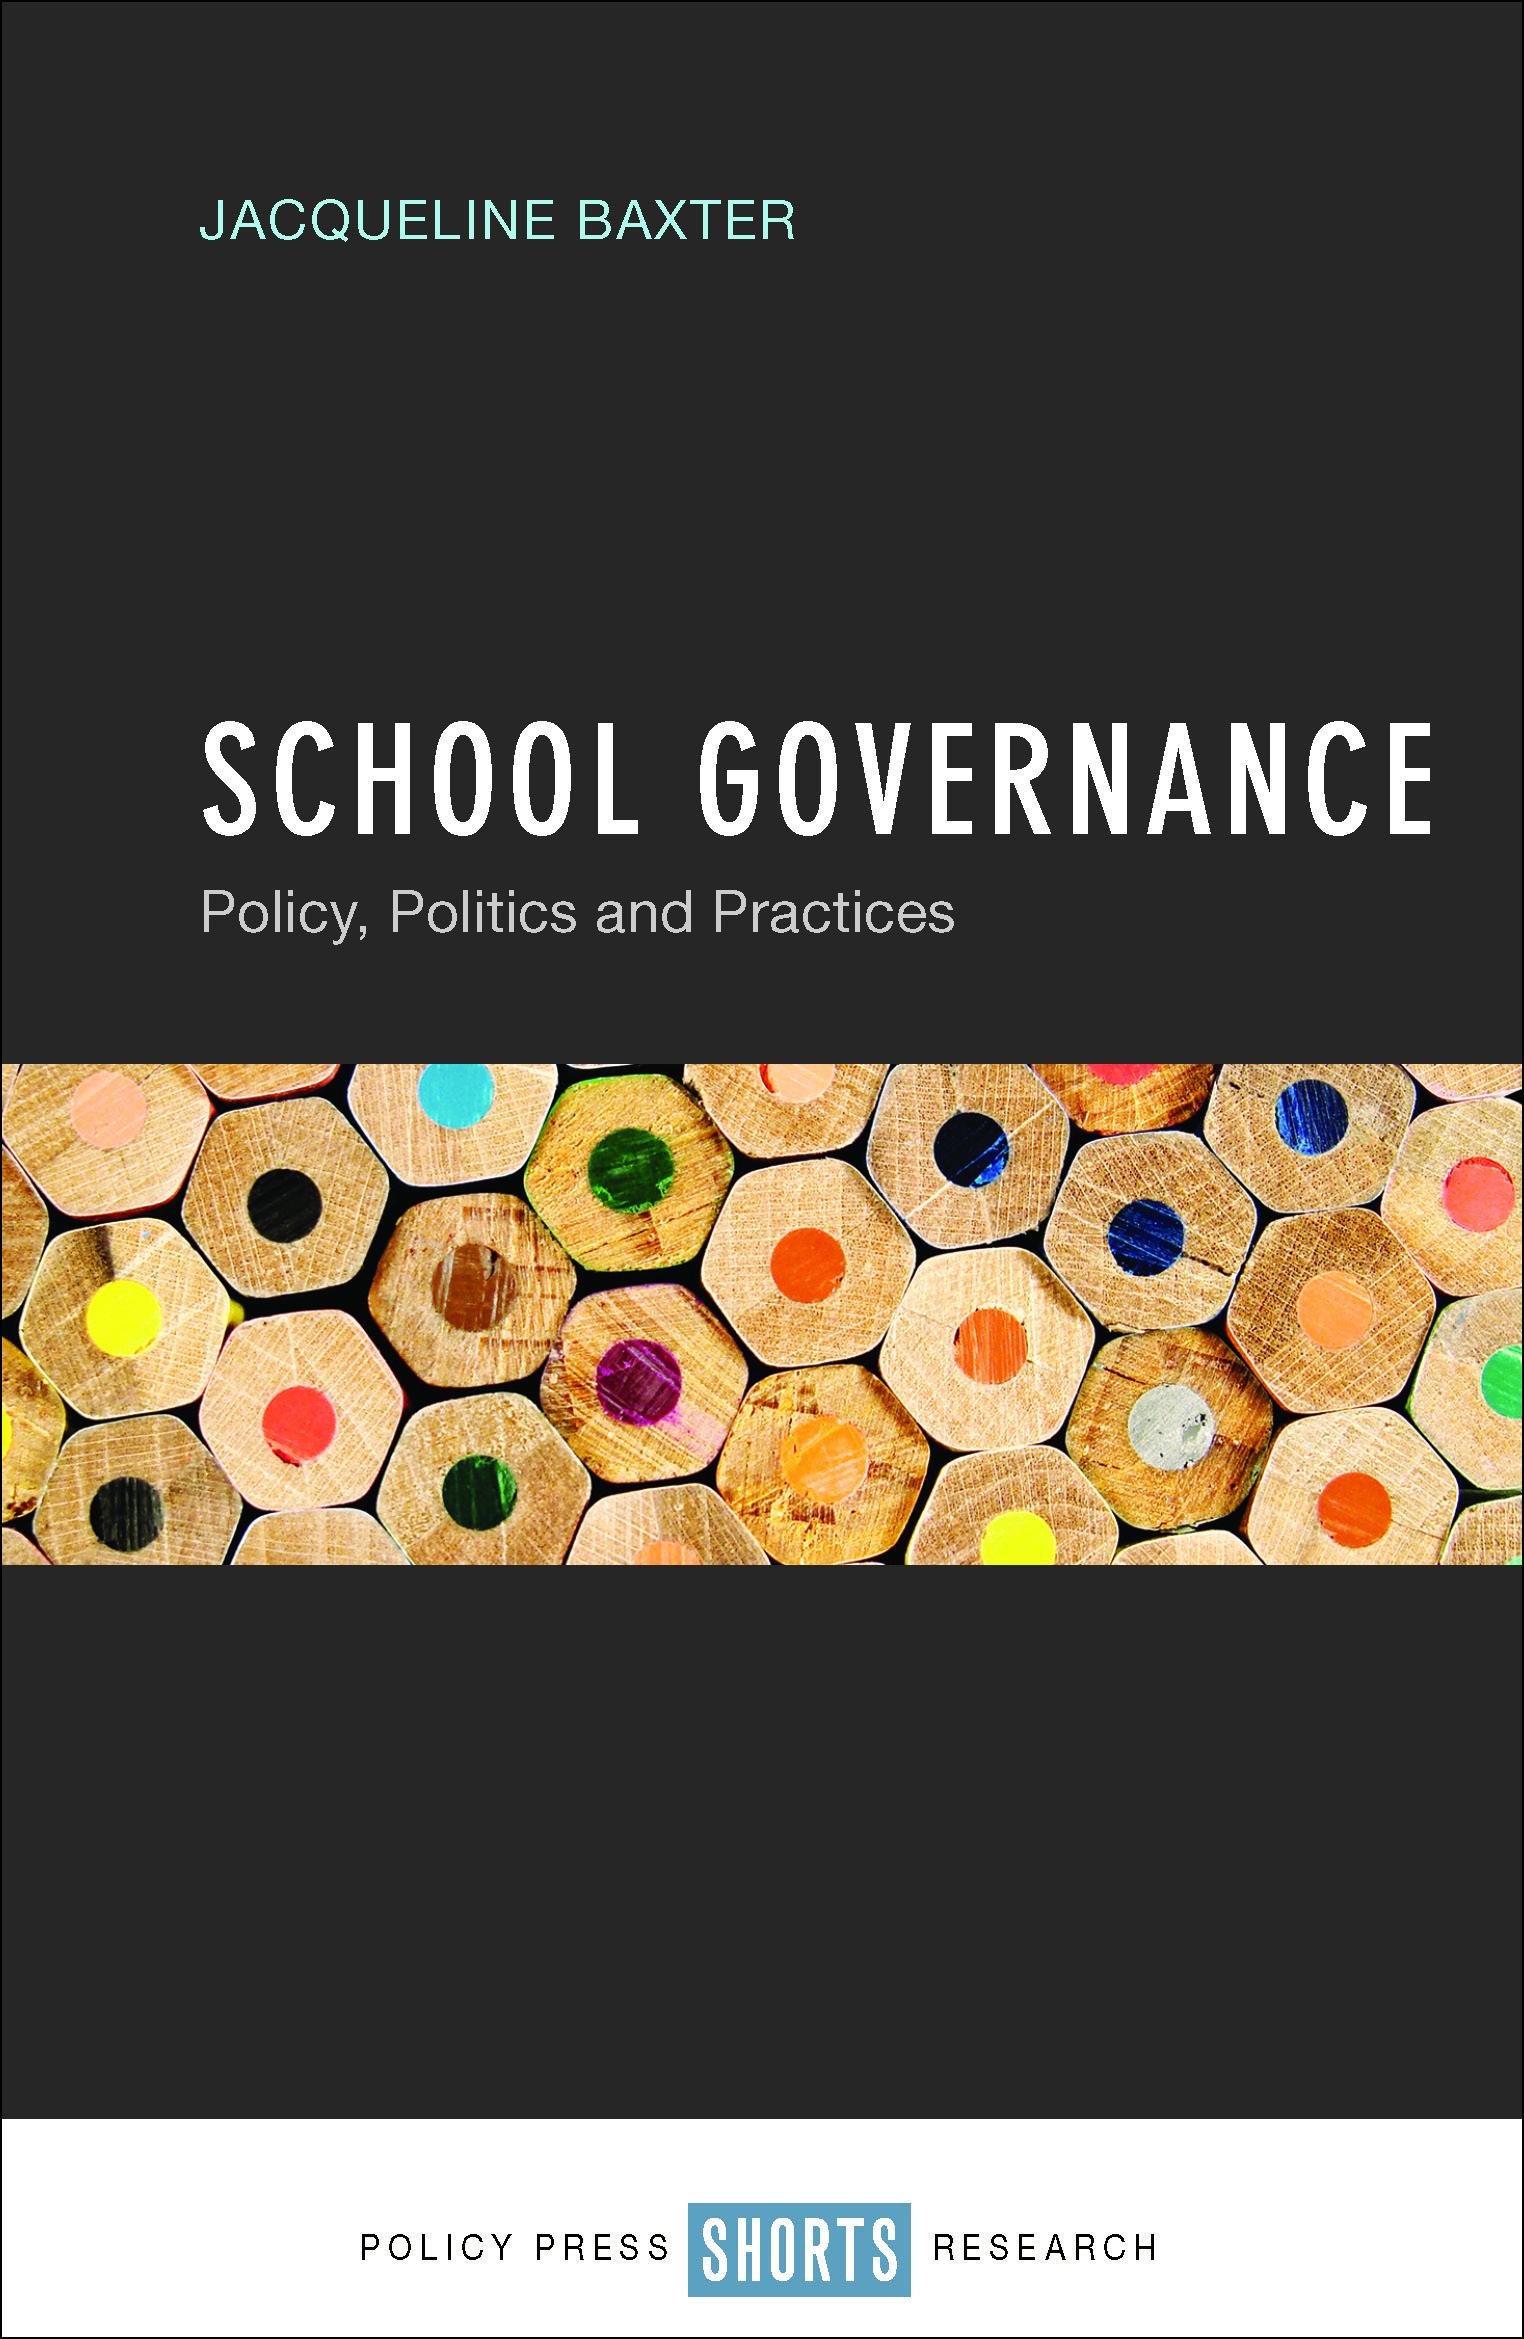 School governance FC